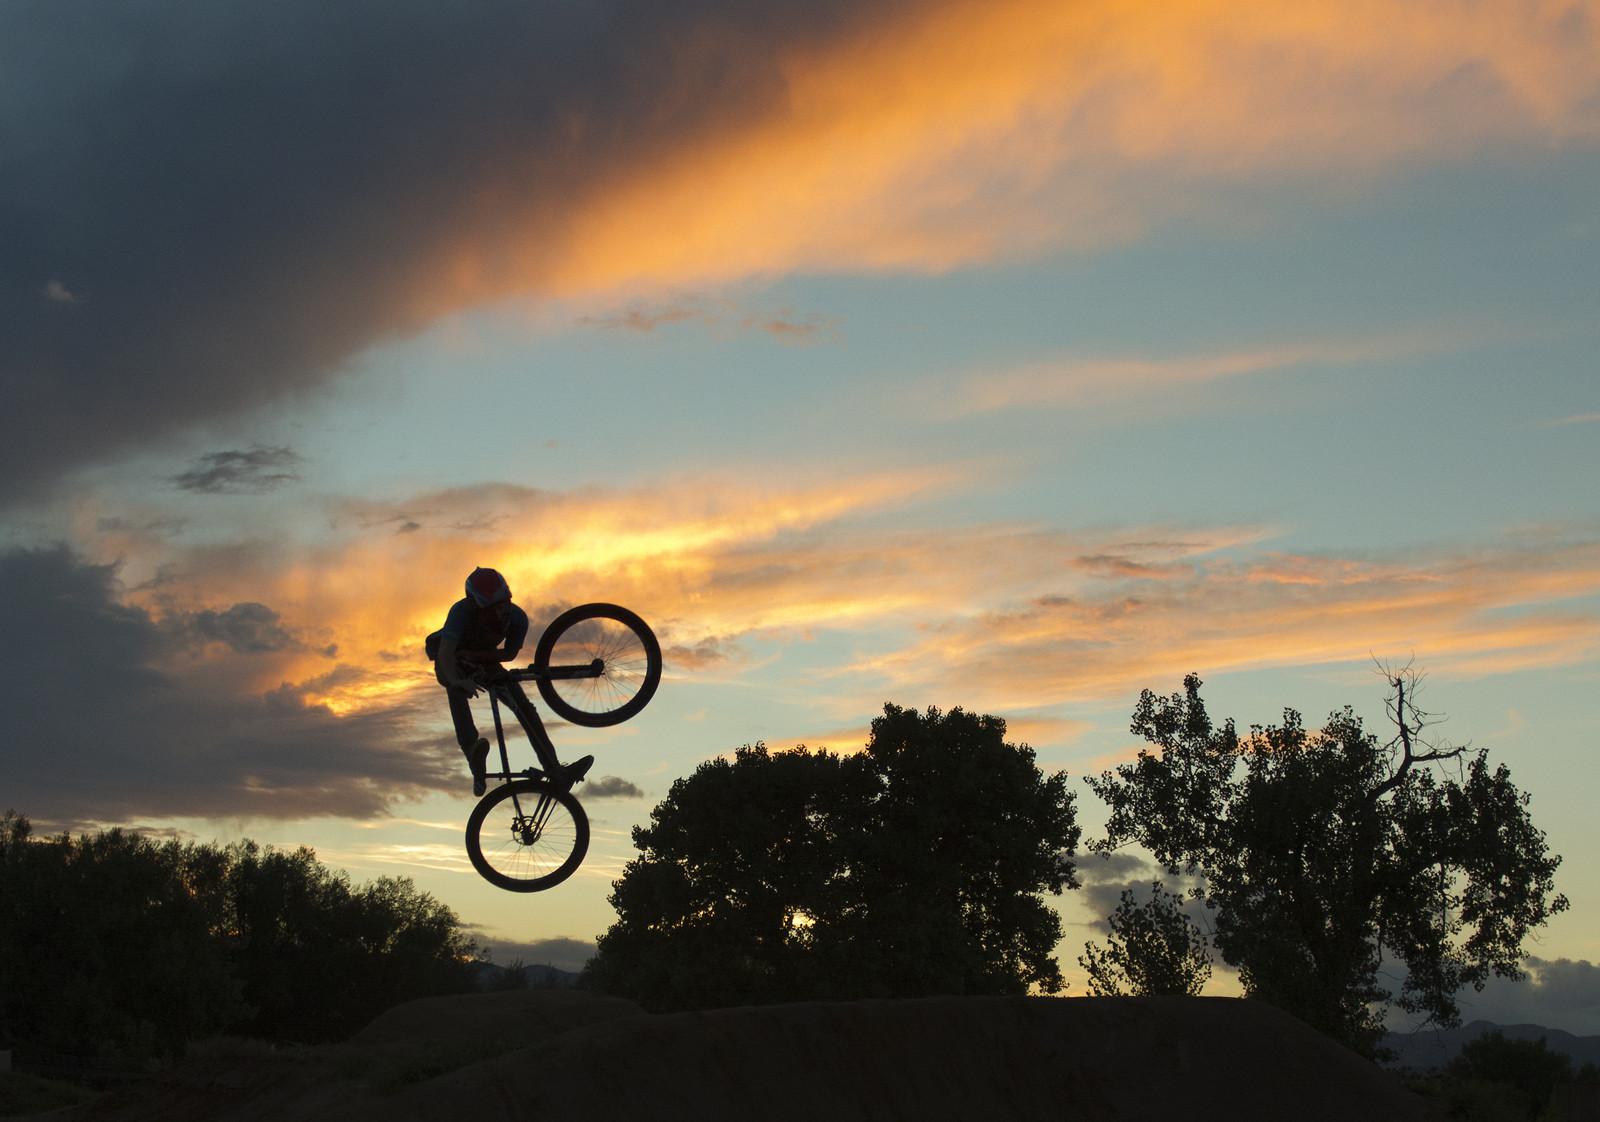 tory unturndown silhouette - Hugekillebrew - Mountain Biking Pictures - Vital MTB